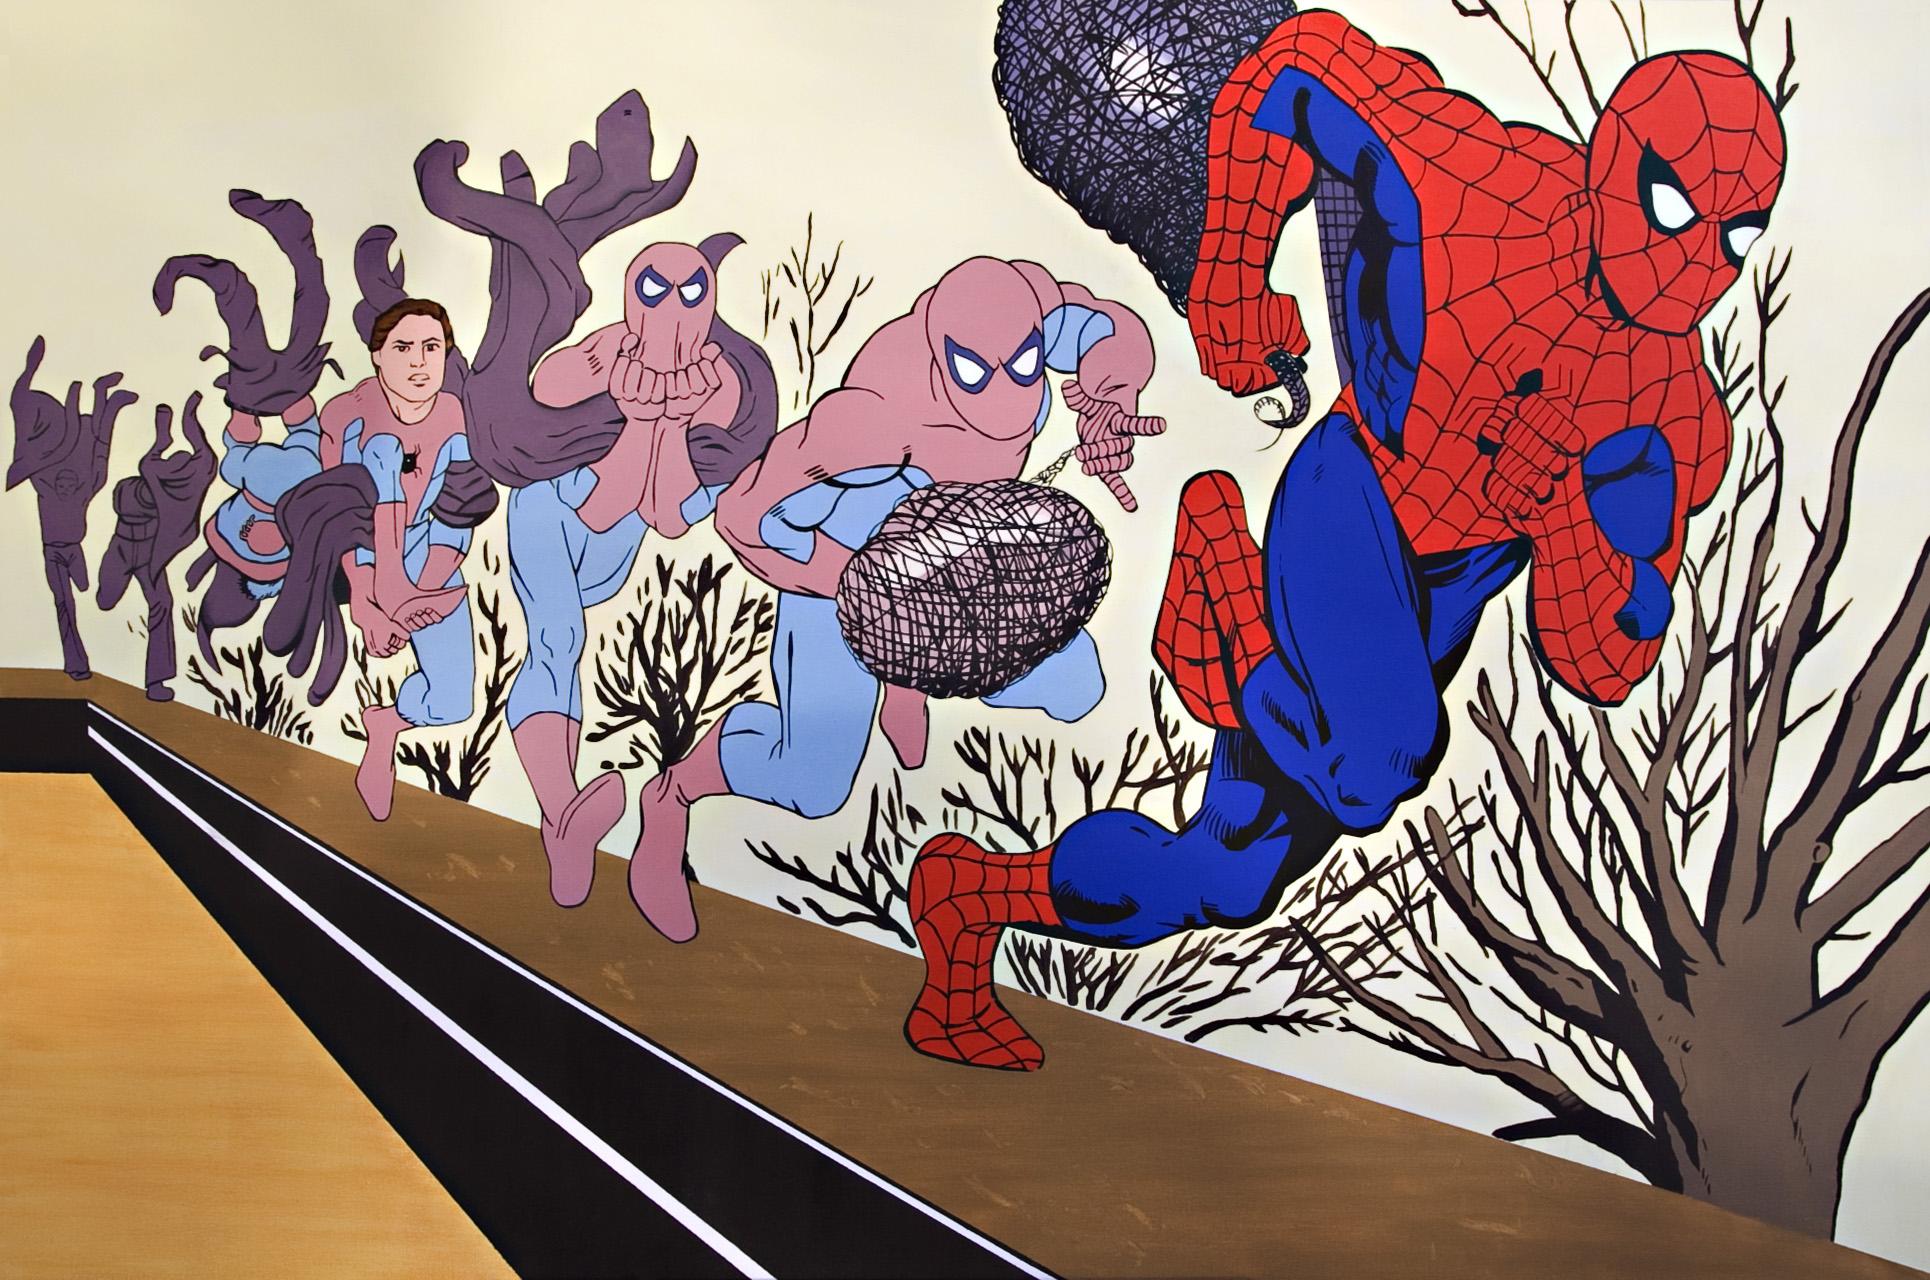 Spiderman 1, 2009